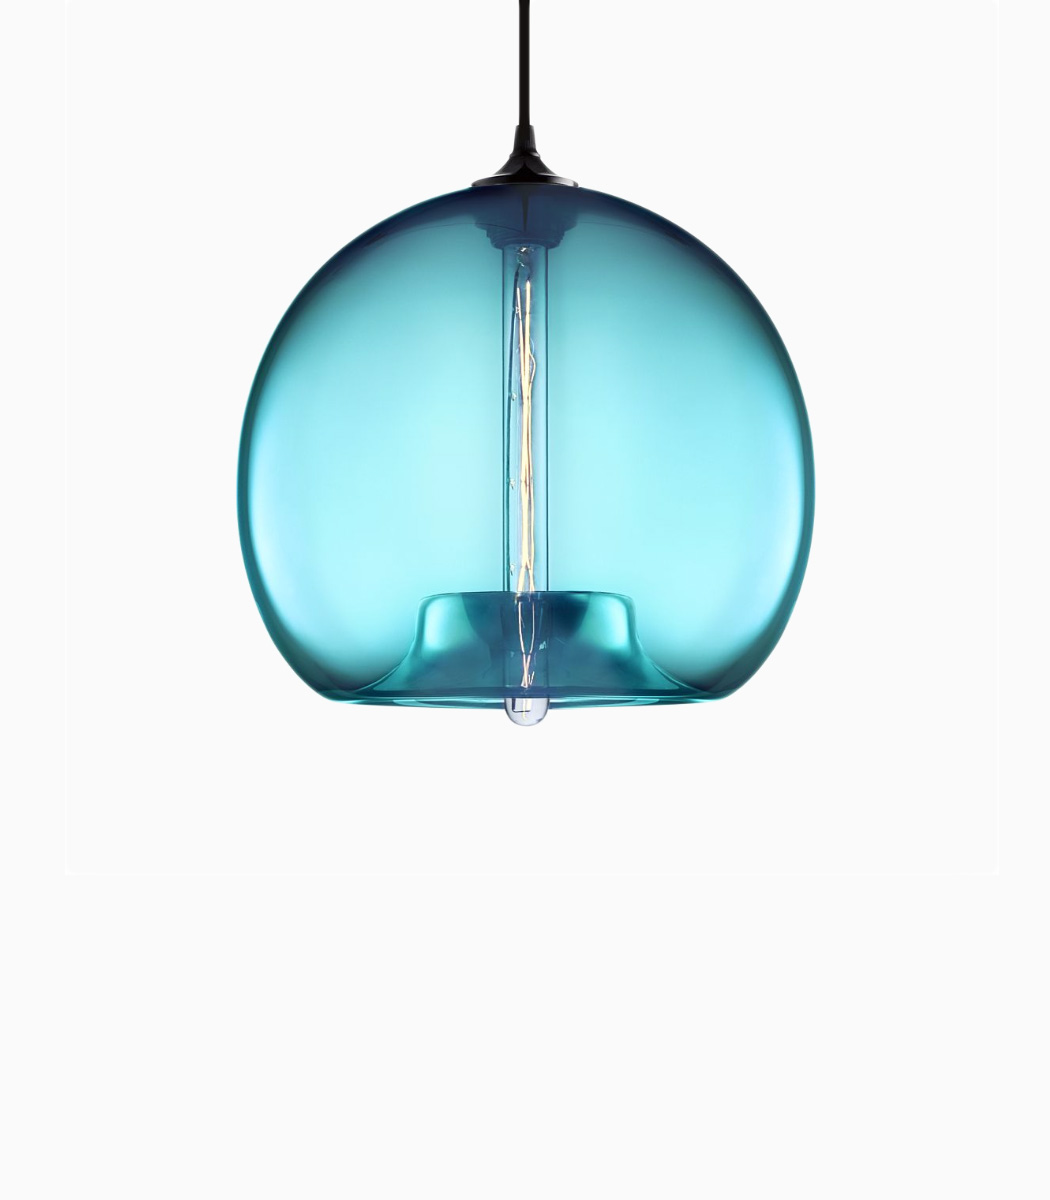 contixmedia Demoshop Produkt Bulb Blau